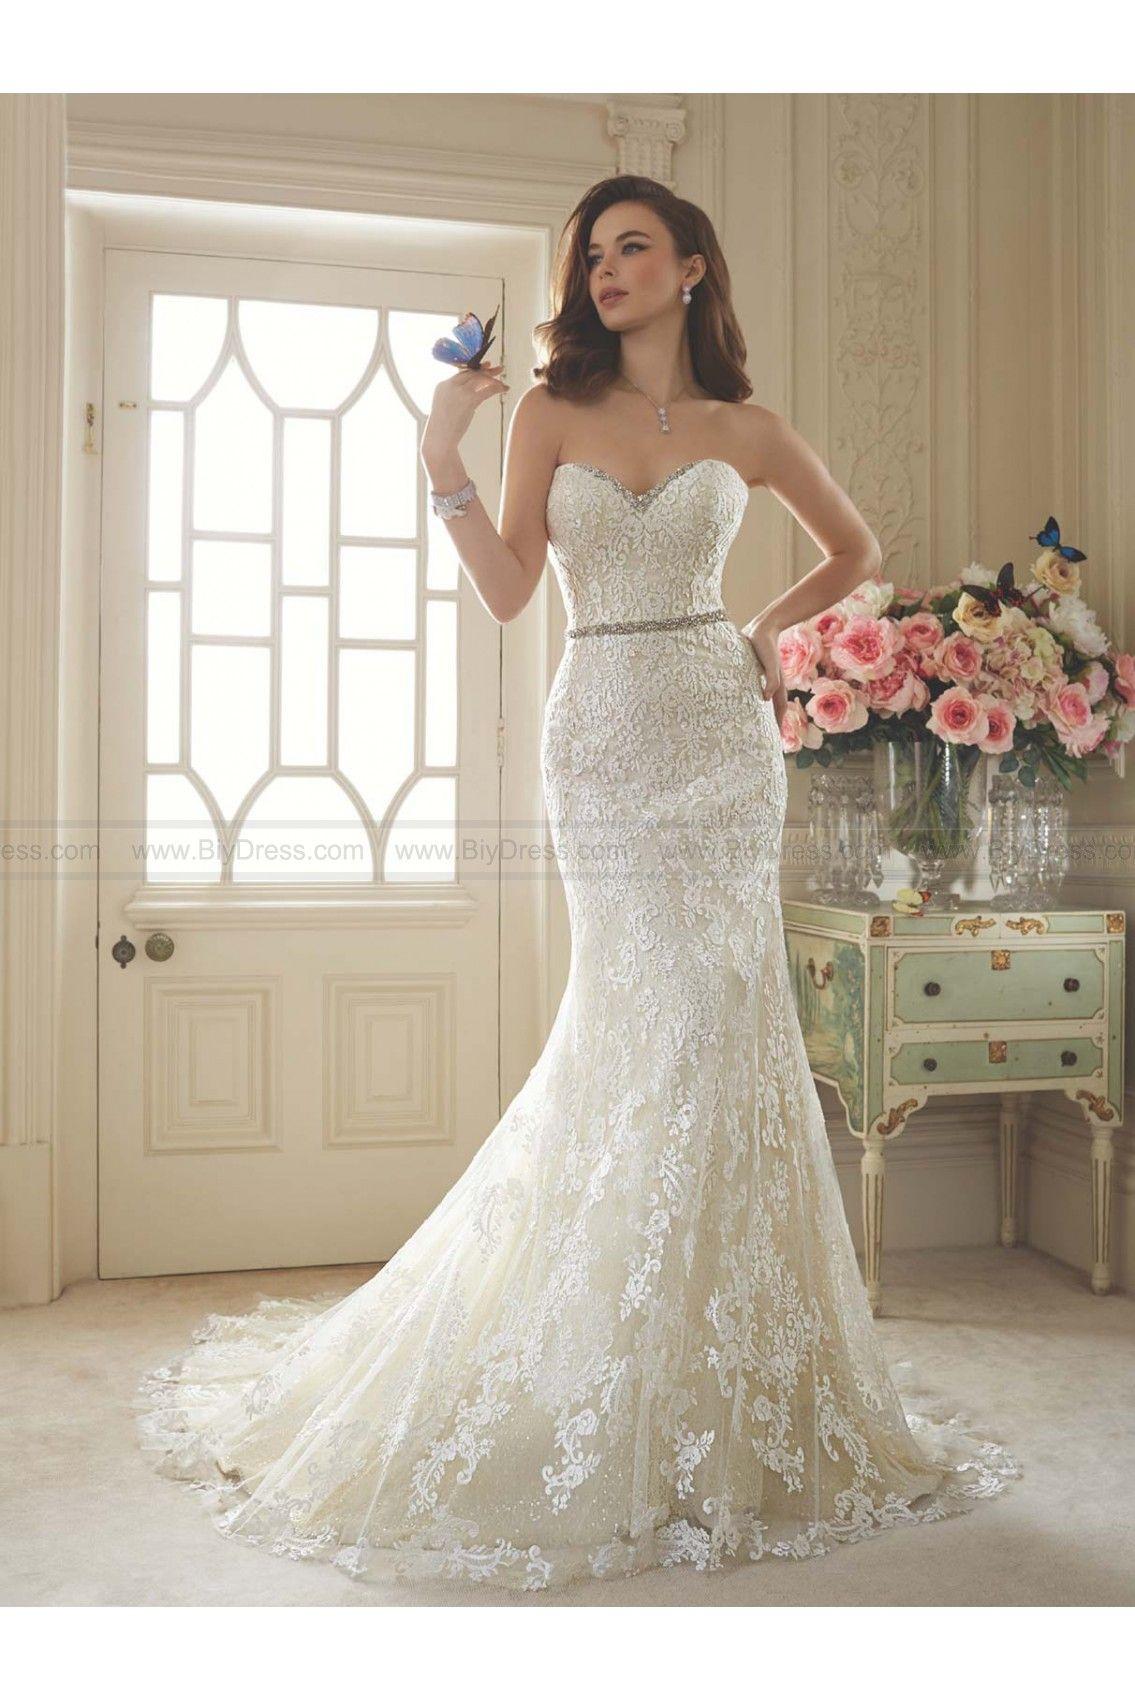 Sophia Tolli Style Y11649 Kenley Formal Wedding Dresses Wedding Dresses Lace Wedding Dresses Wedding Dress Guide